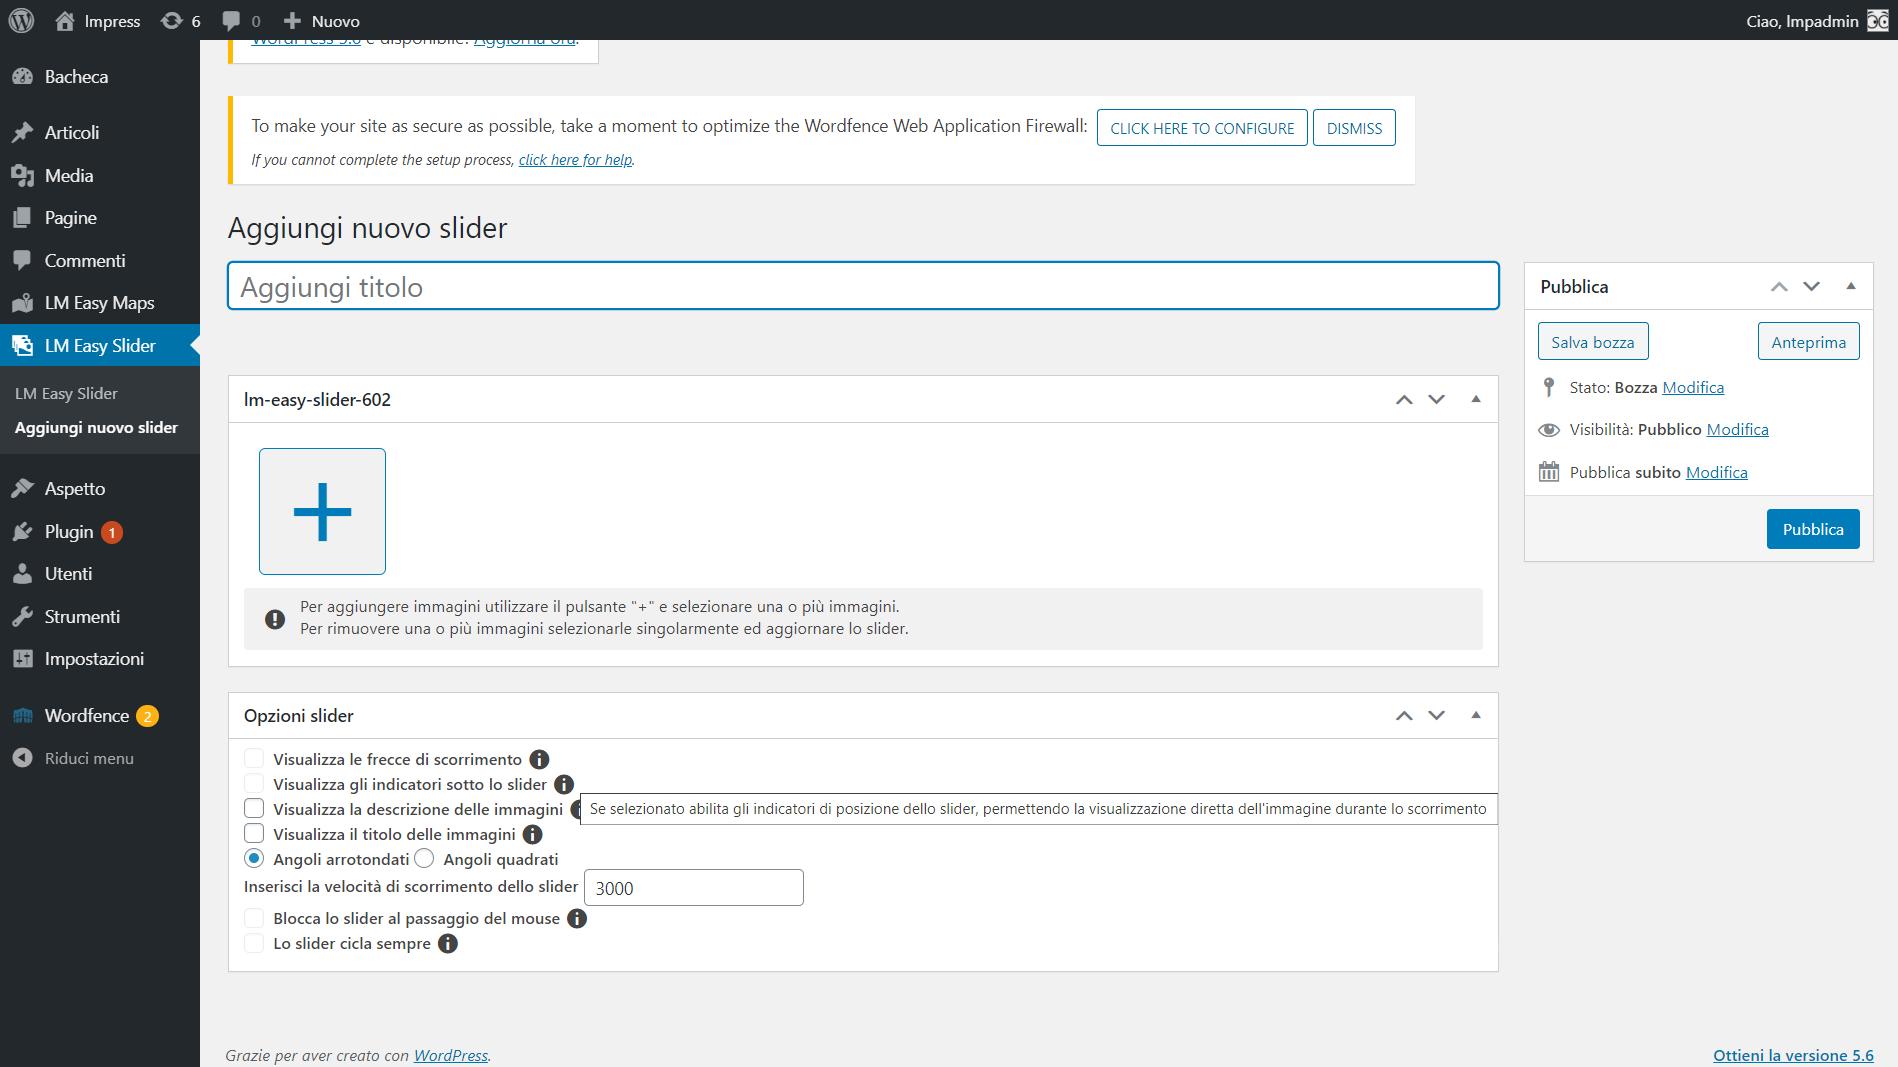 Info aggiuntive su opzioni Slider / Additional info on Slider options